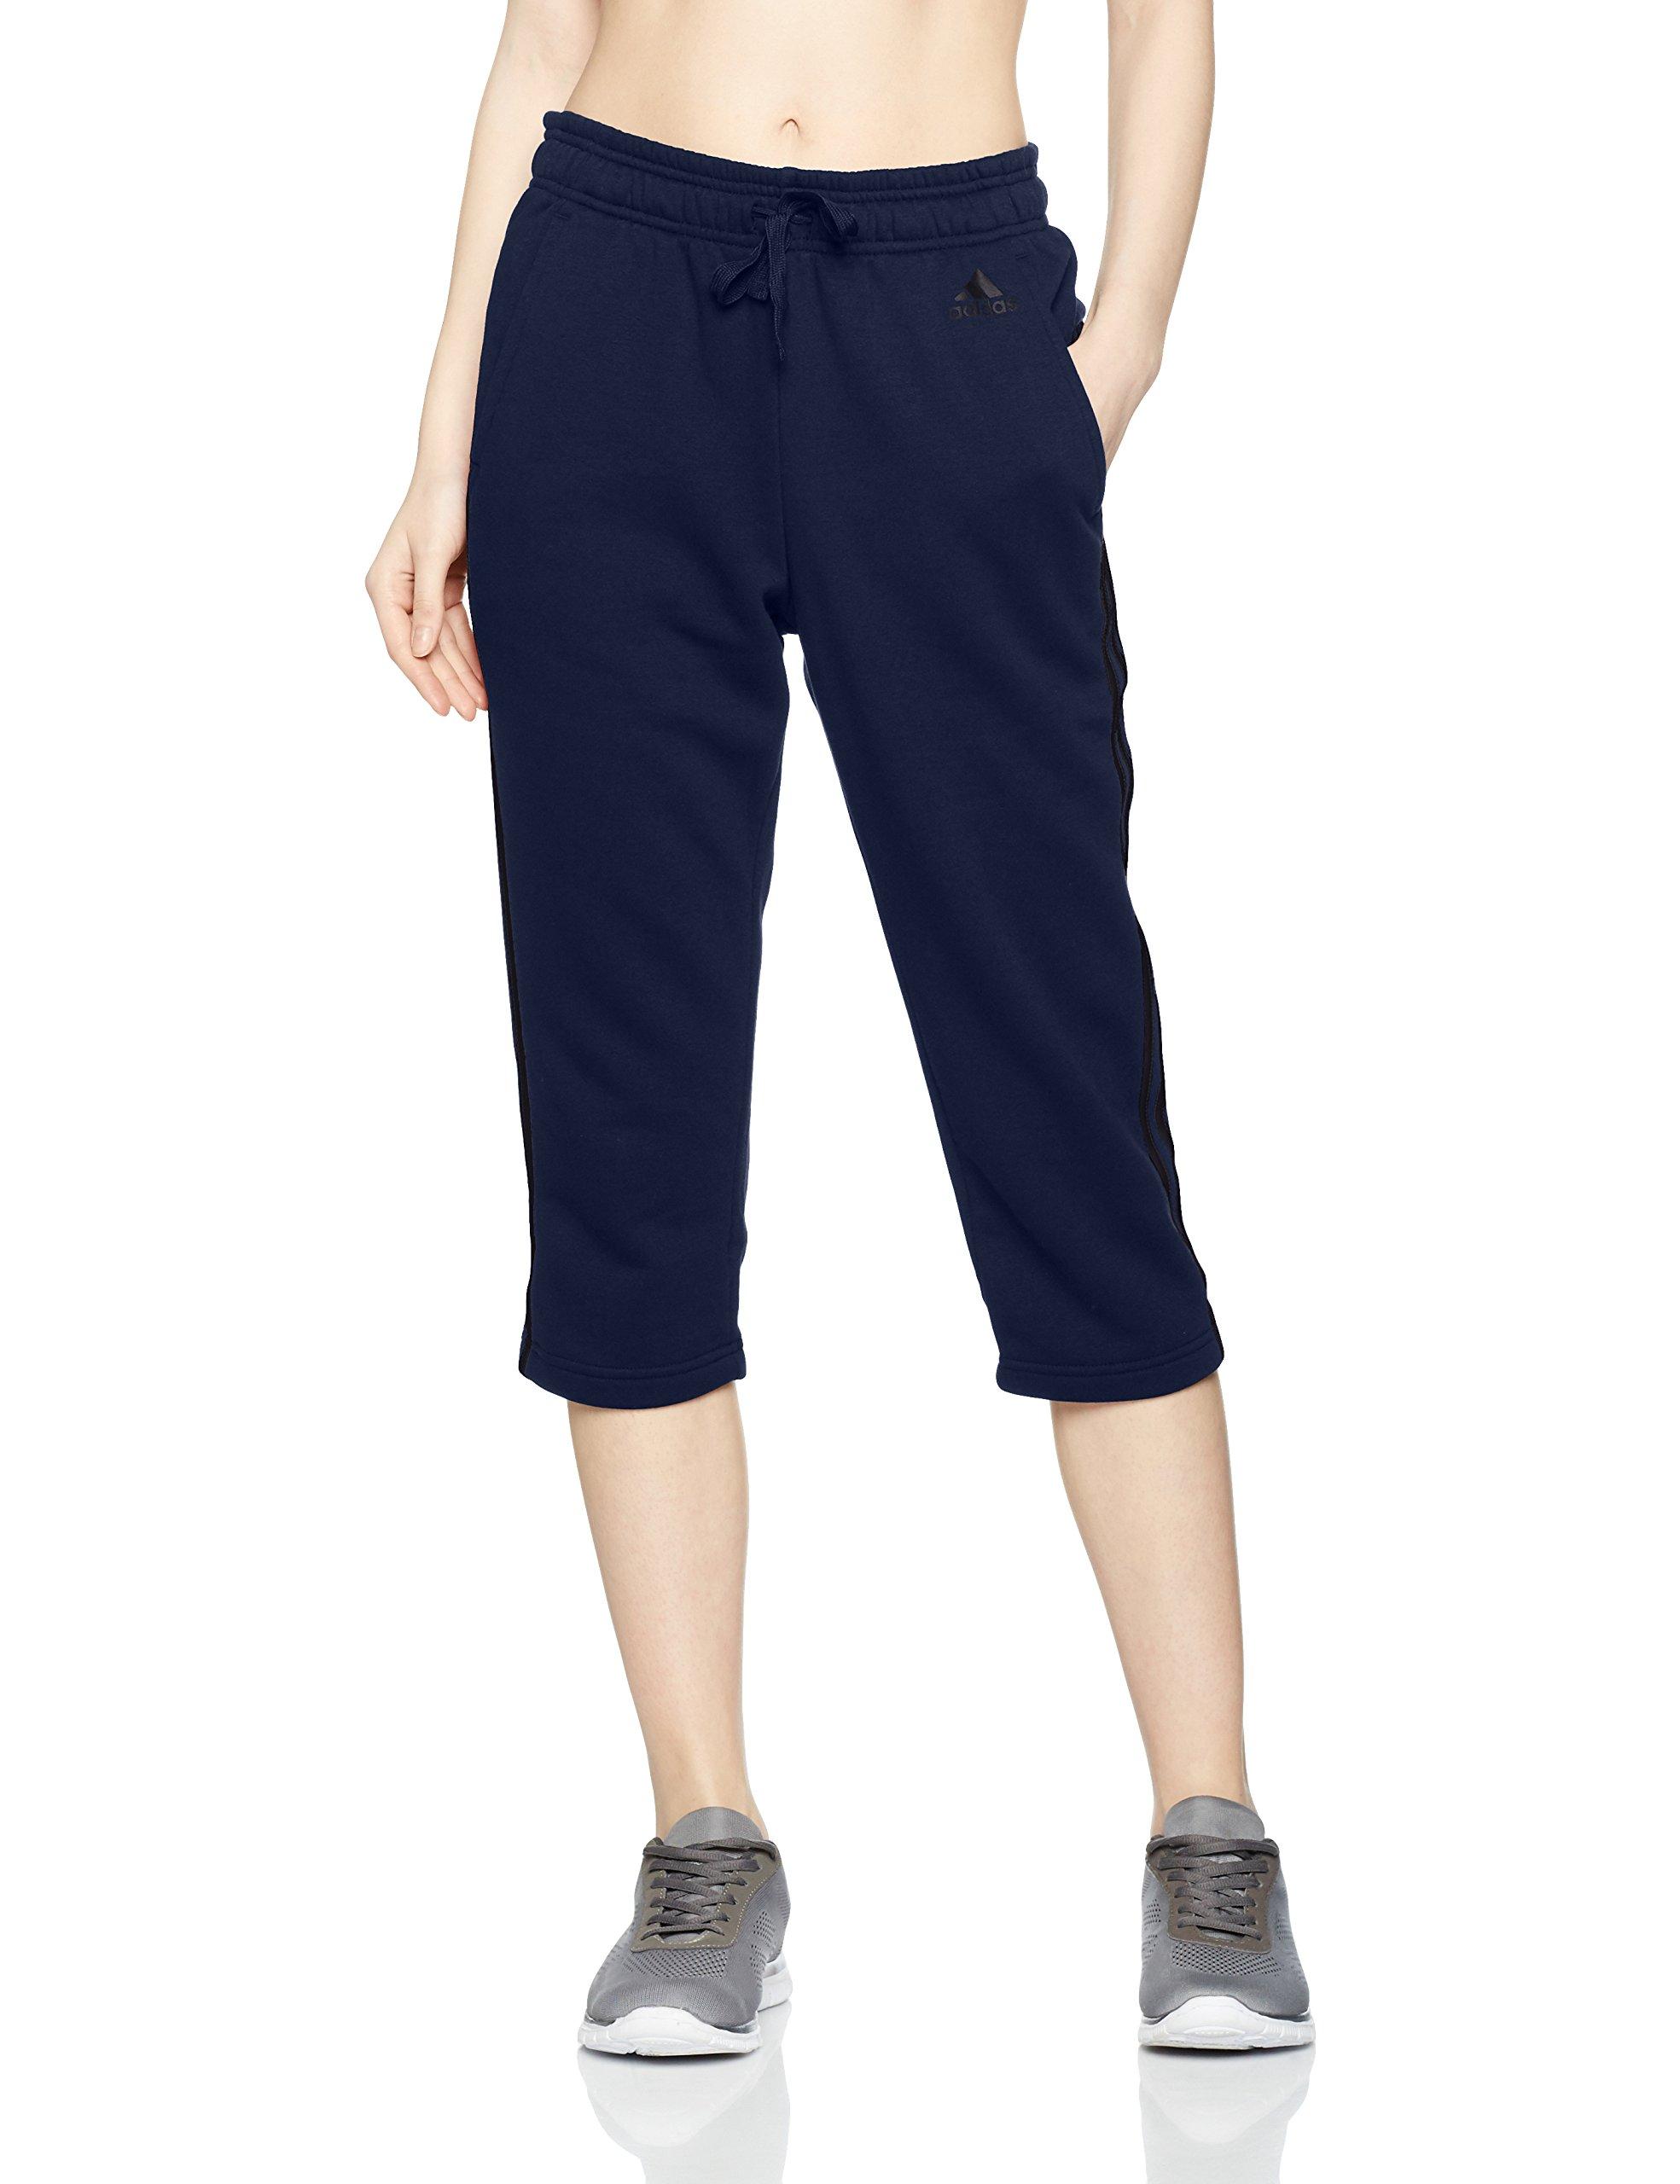 adidas 女式必备3条纹 Sweat 裤子,女式,必备3条纹